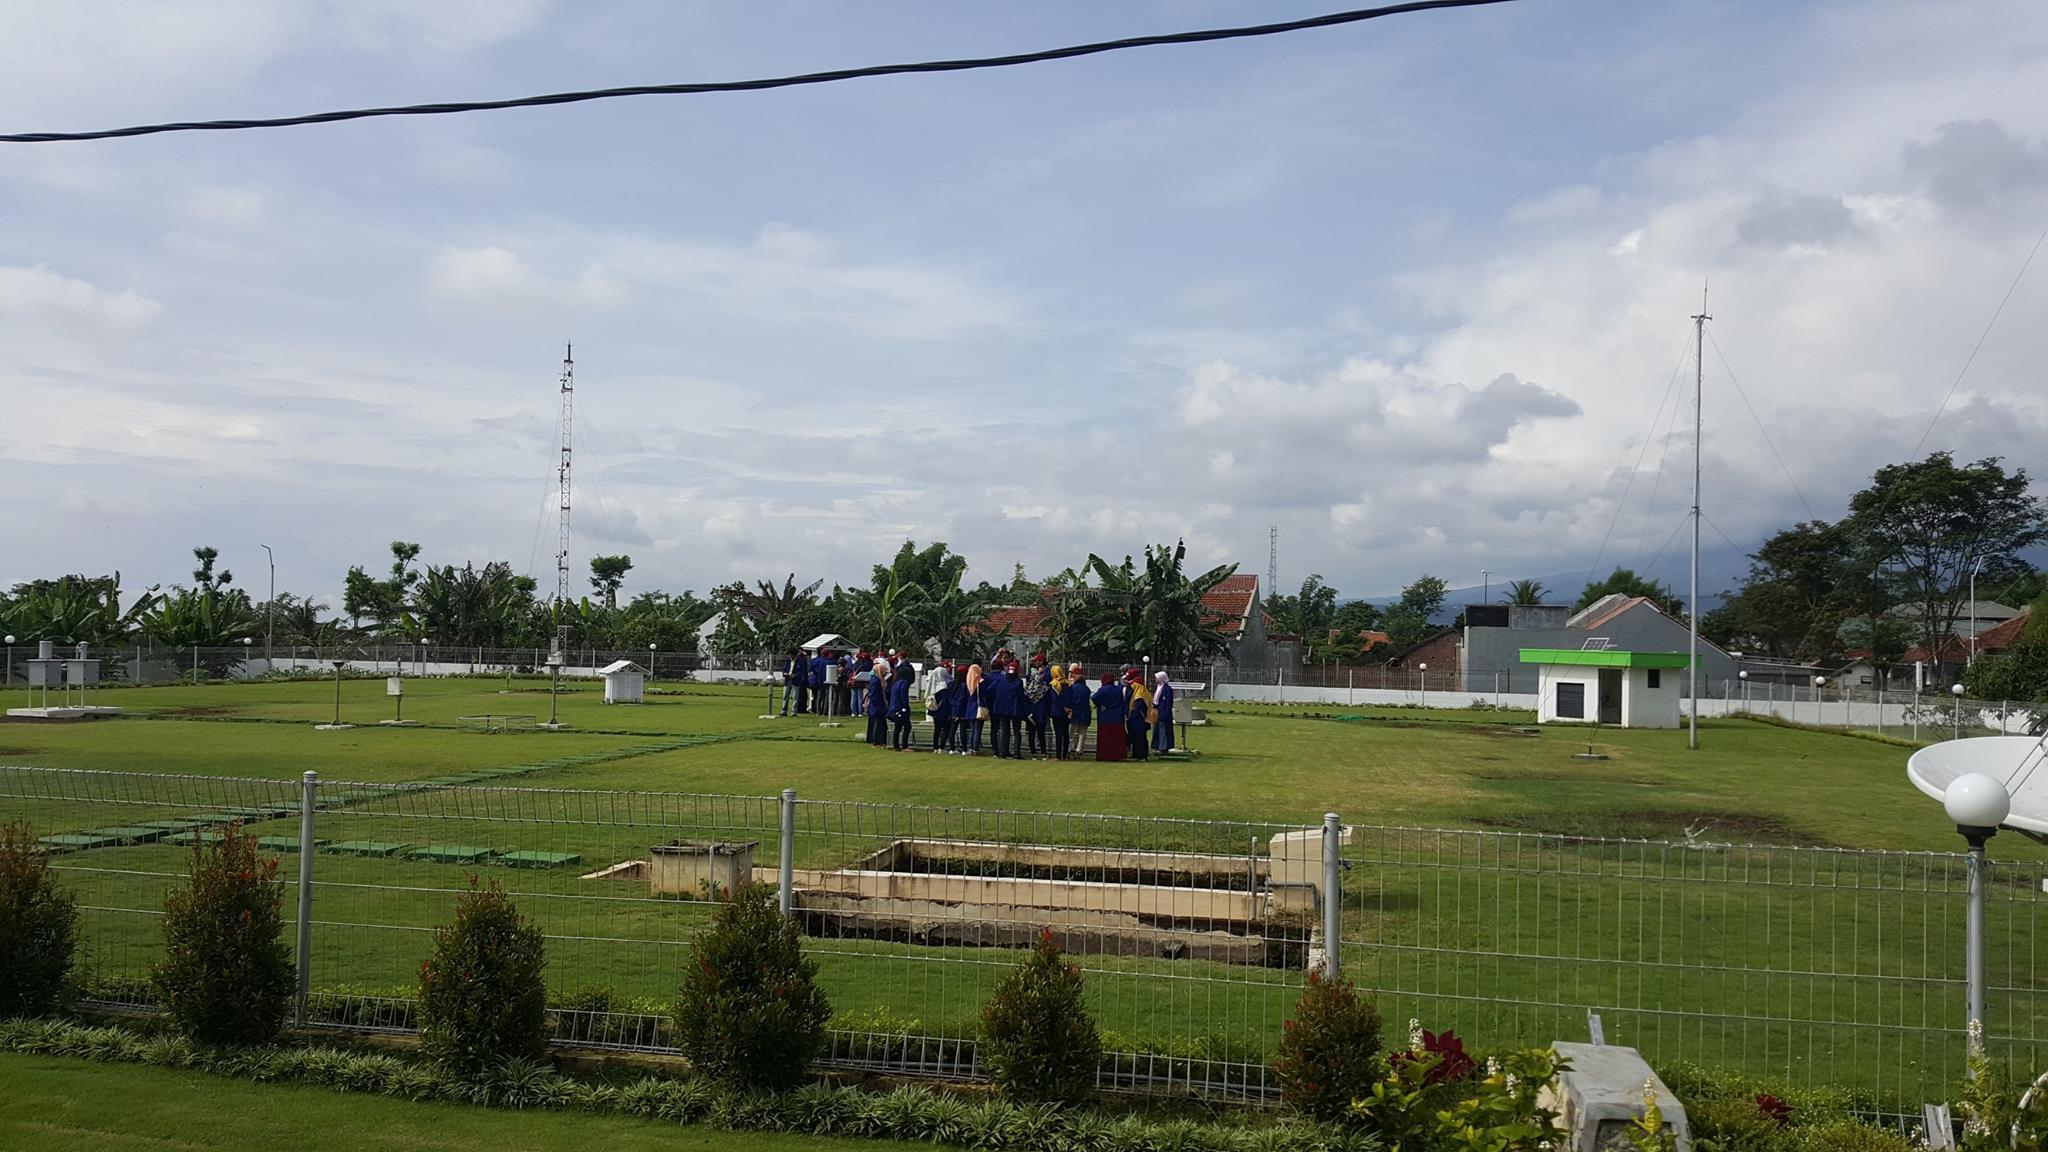 Selasa,17-01-2017 Kunjungan Mahasiswa Universitas Negeri Yogyakarta